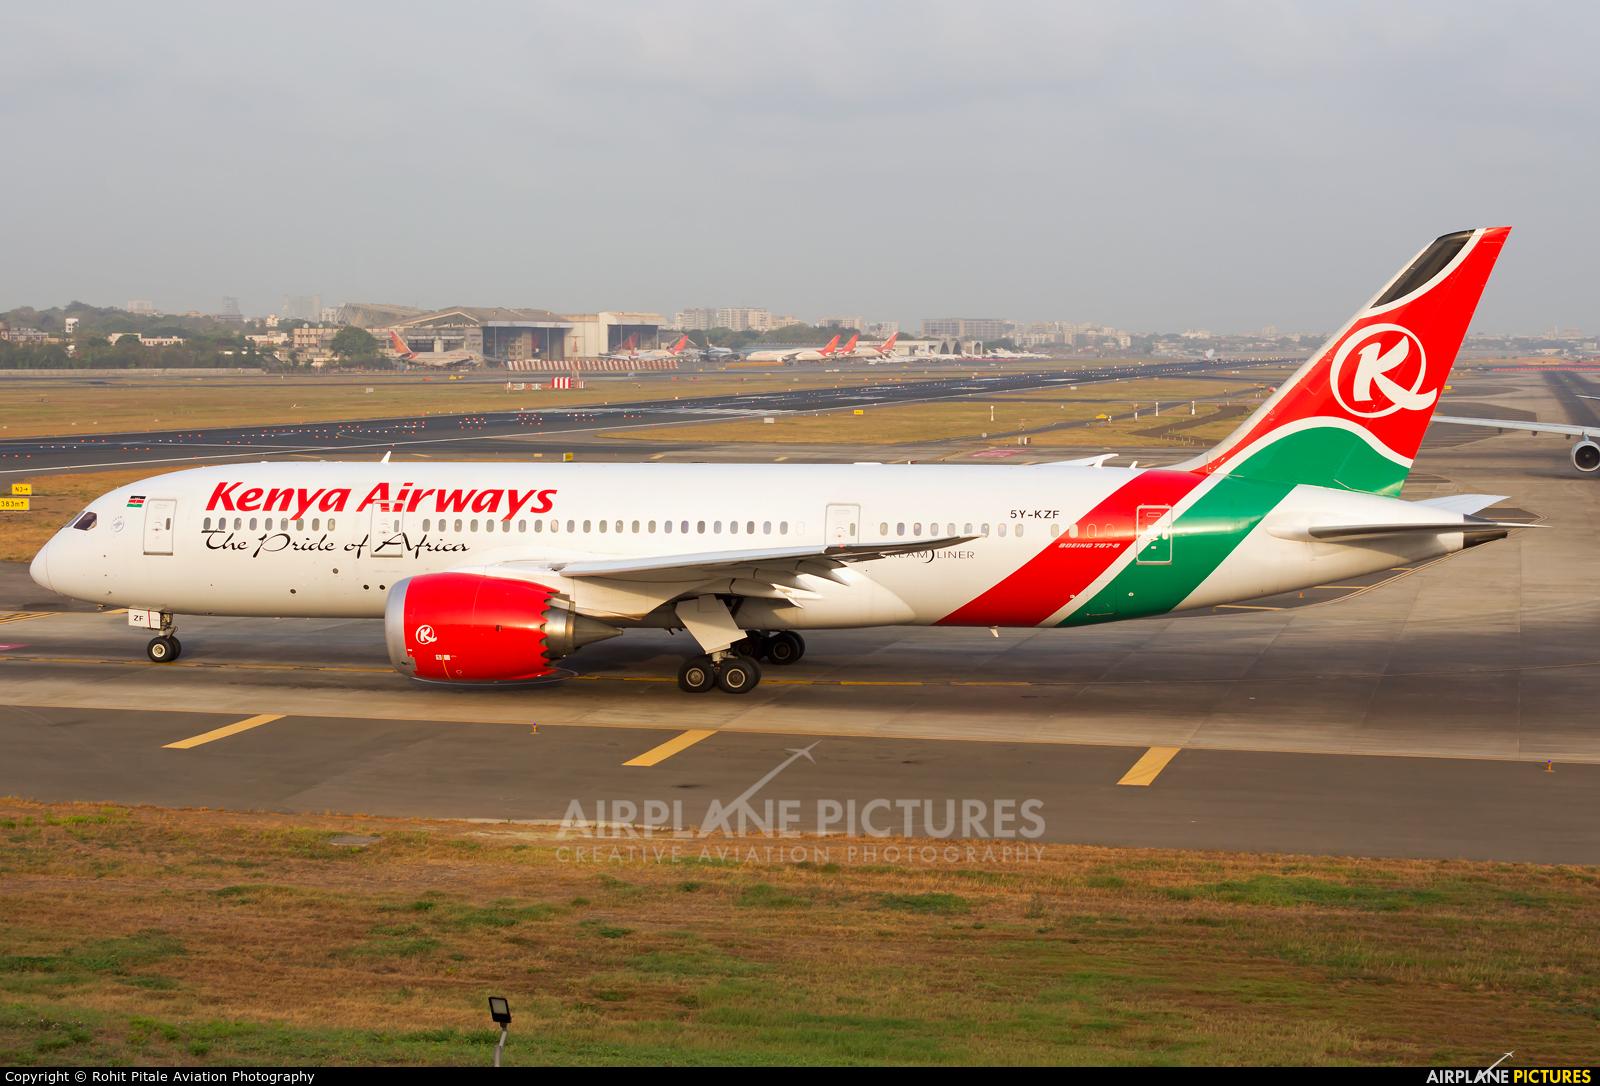 Kenya Airways 5Y-KZF aircraft at Mumbai - Chhatrapati Shivaji Intl